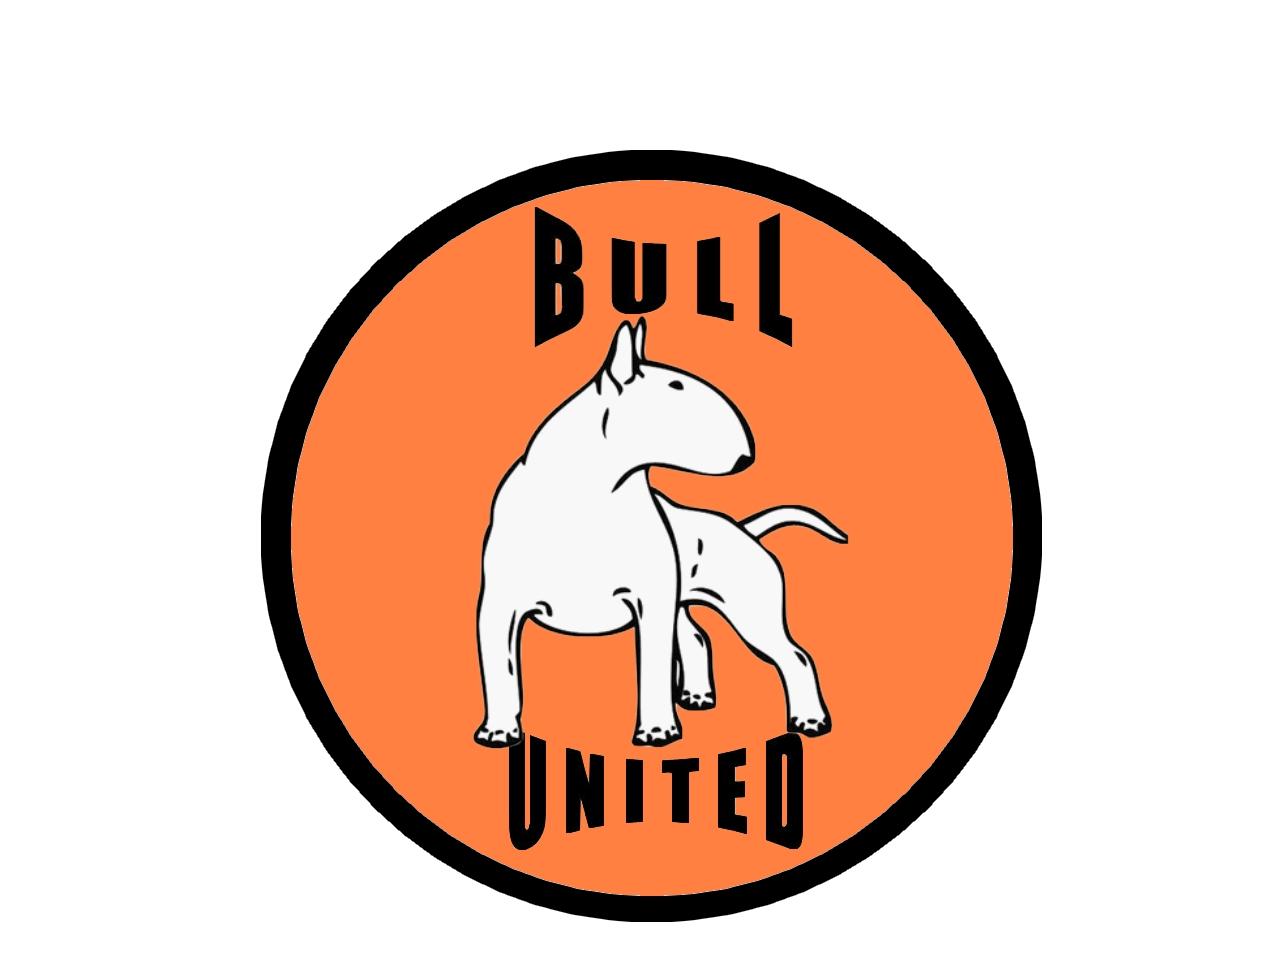 Bull United